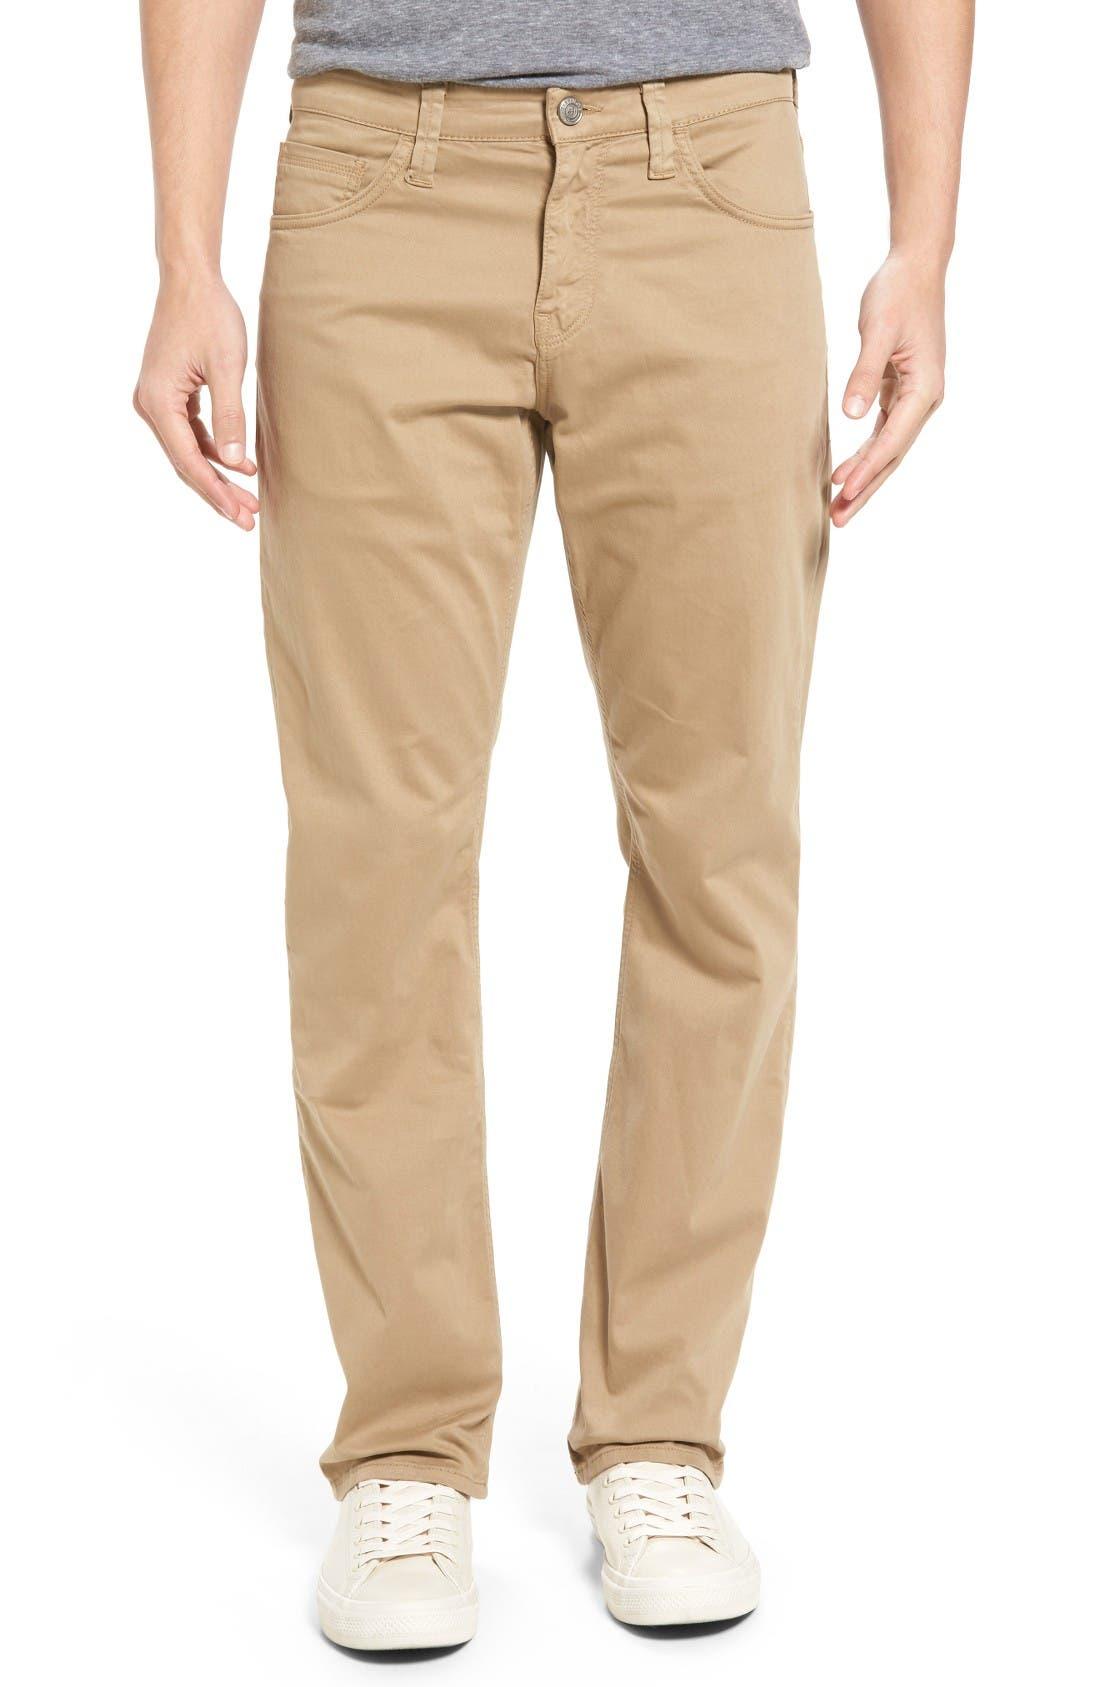 Matt Relaxed Fit Jeans,                         Main,                         color, British Khaki Twill